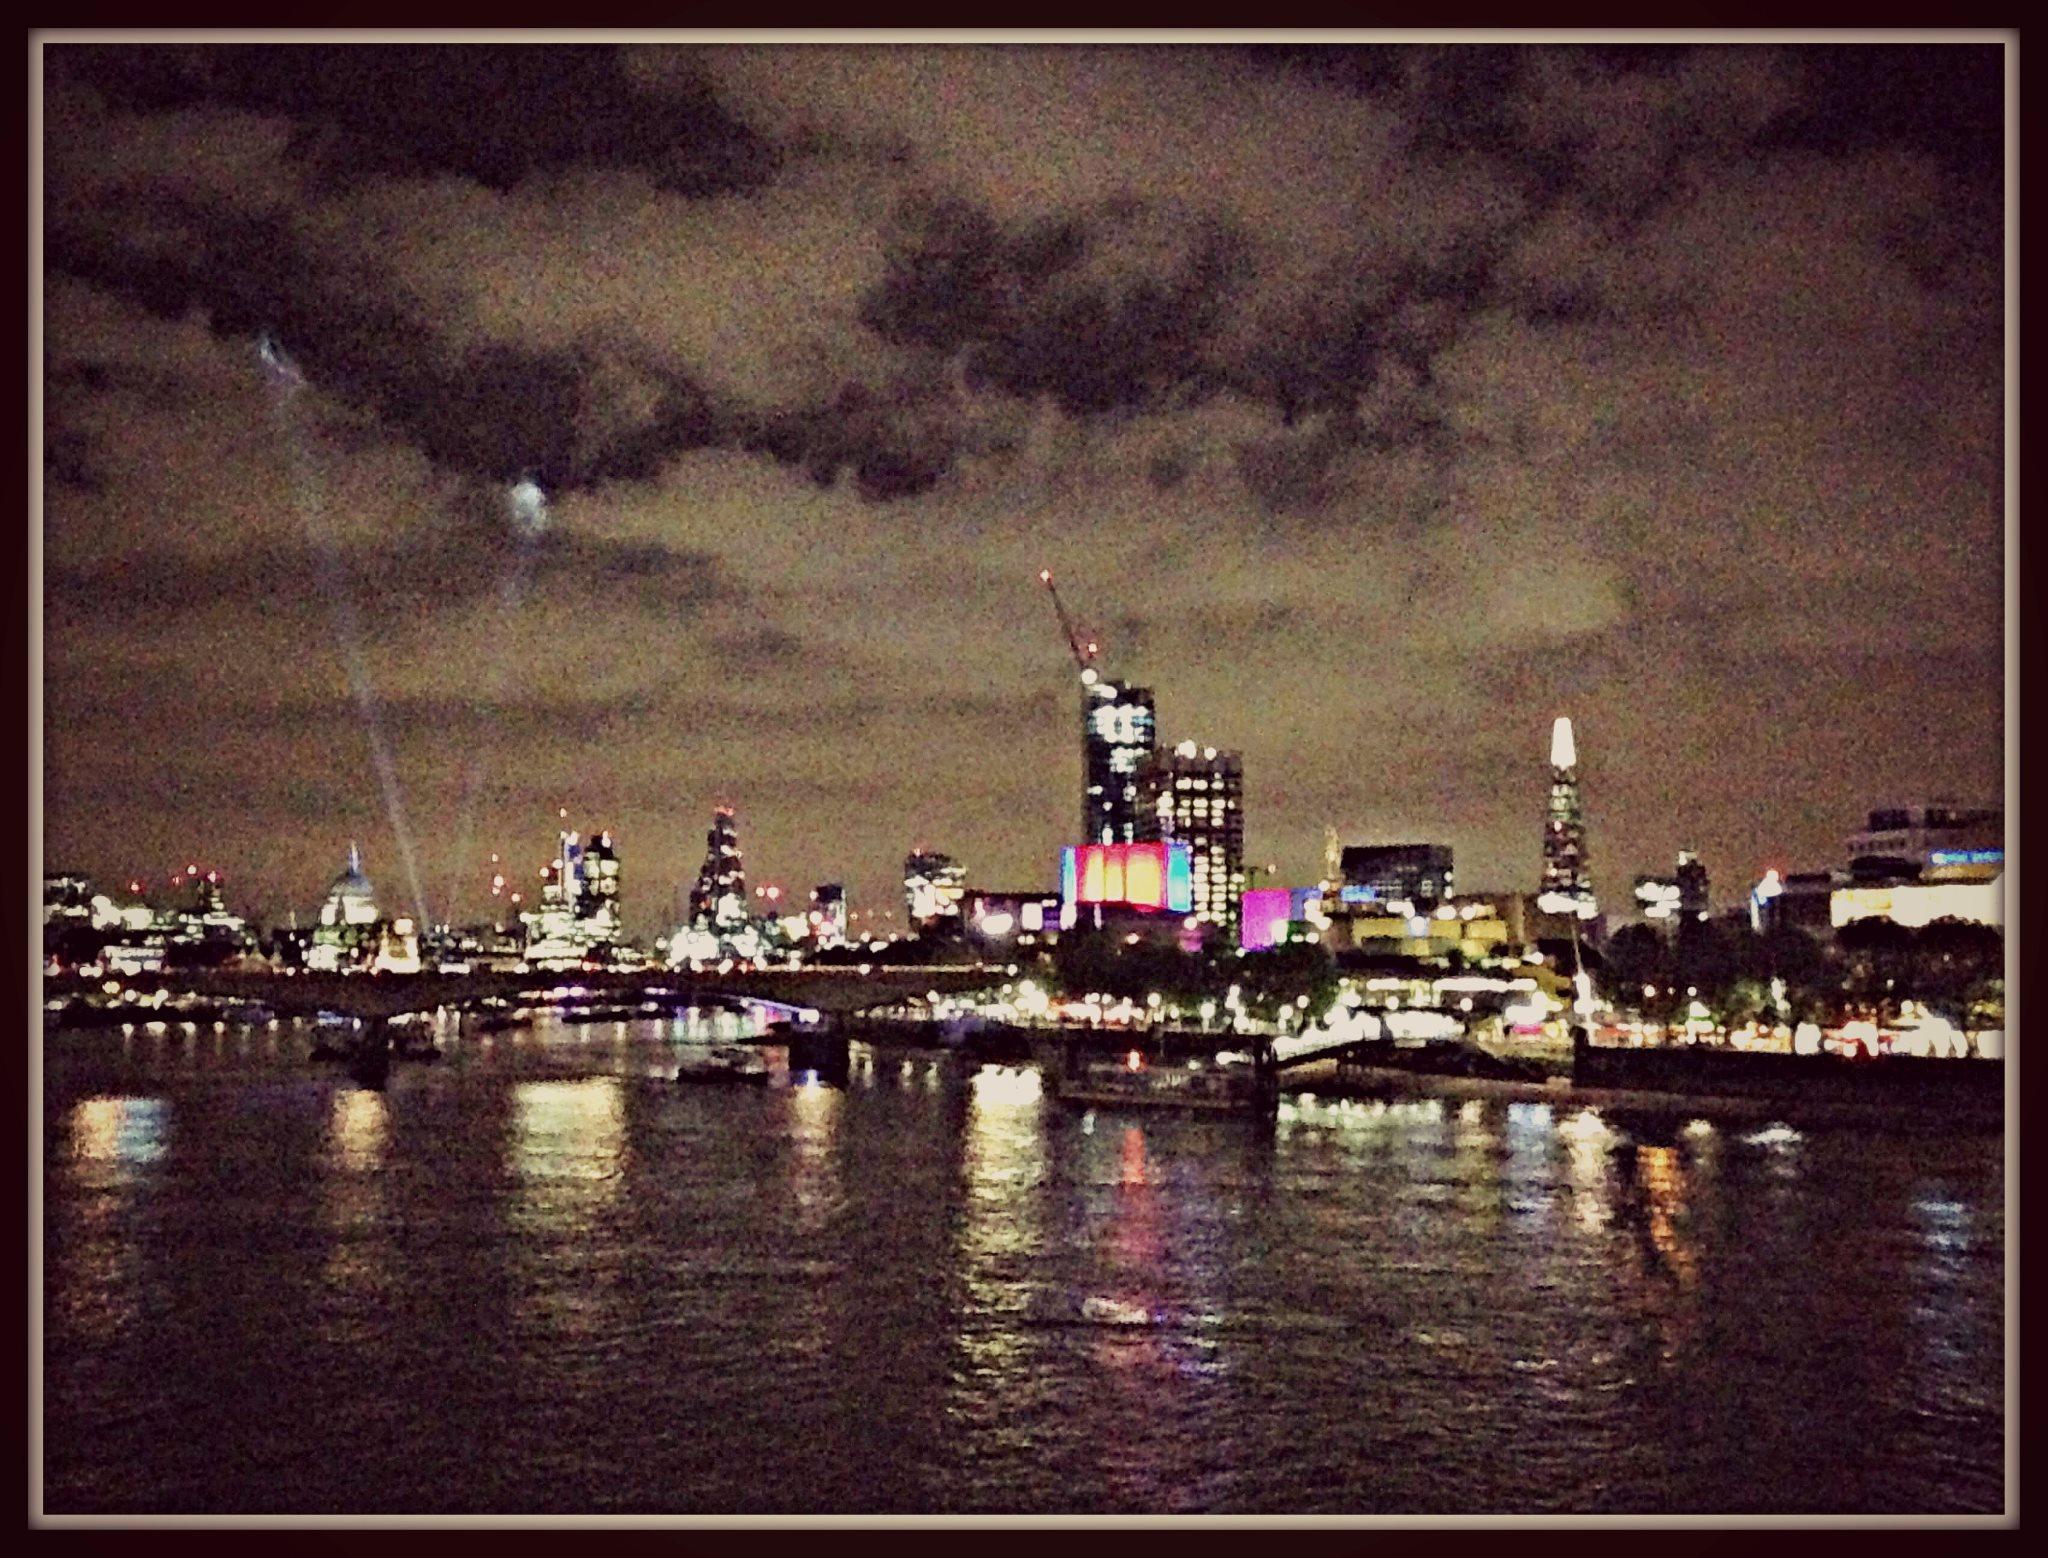 London skyline, by night